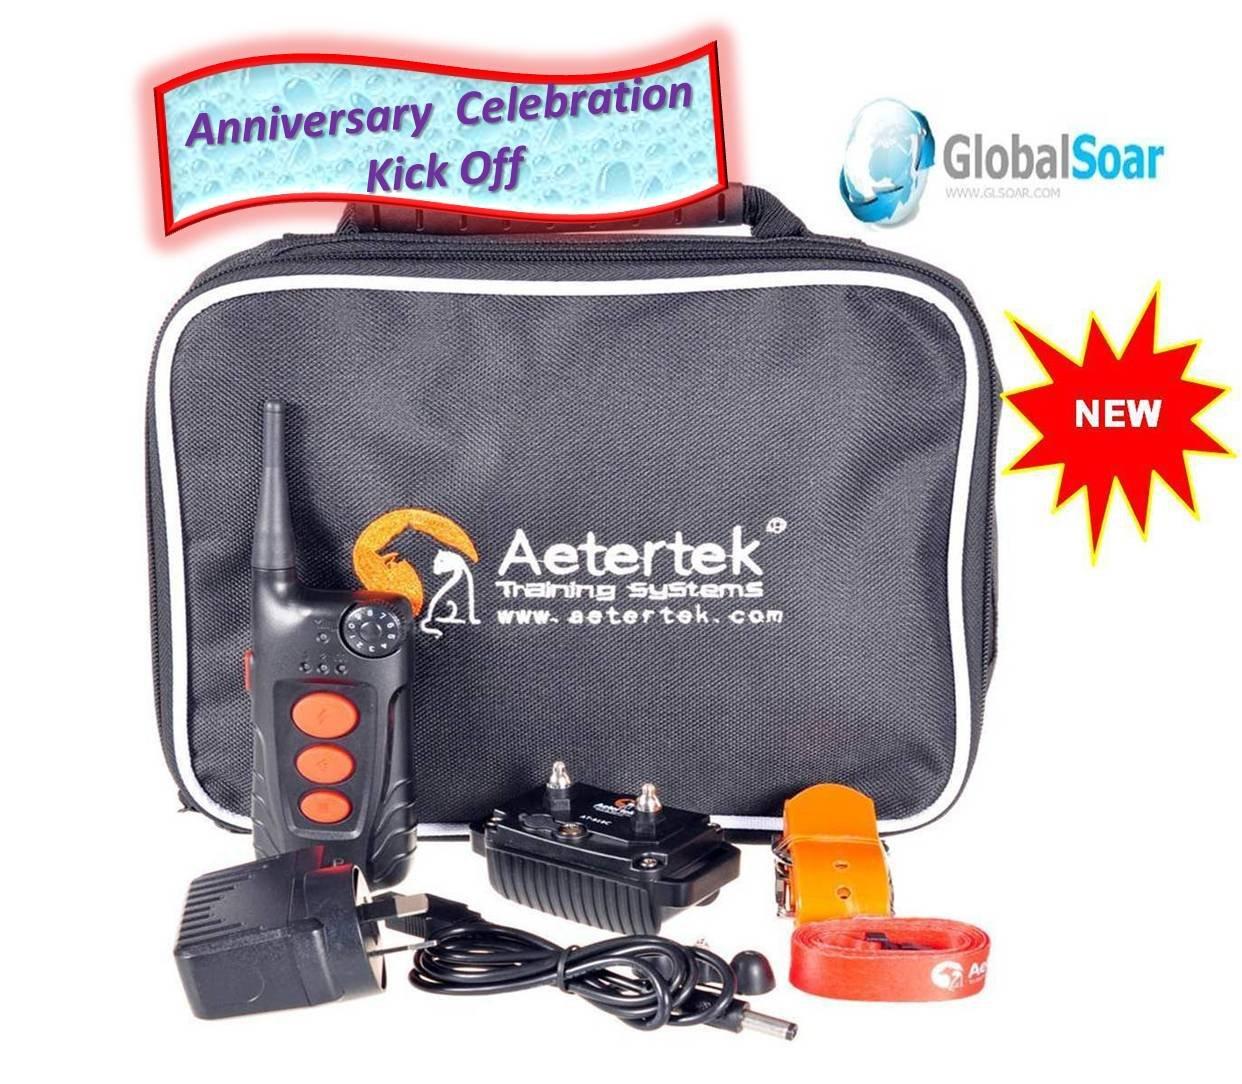 Aetertek 918C-1 600 Yard 9 Level 1 Dog Training Anti Bark & Waterproof Collar